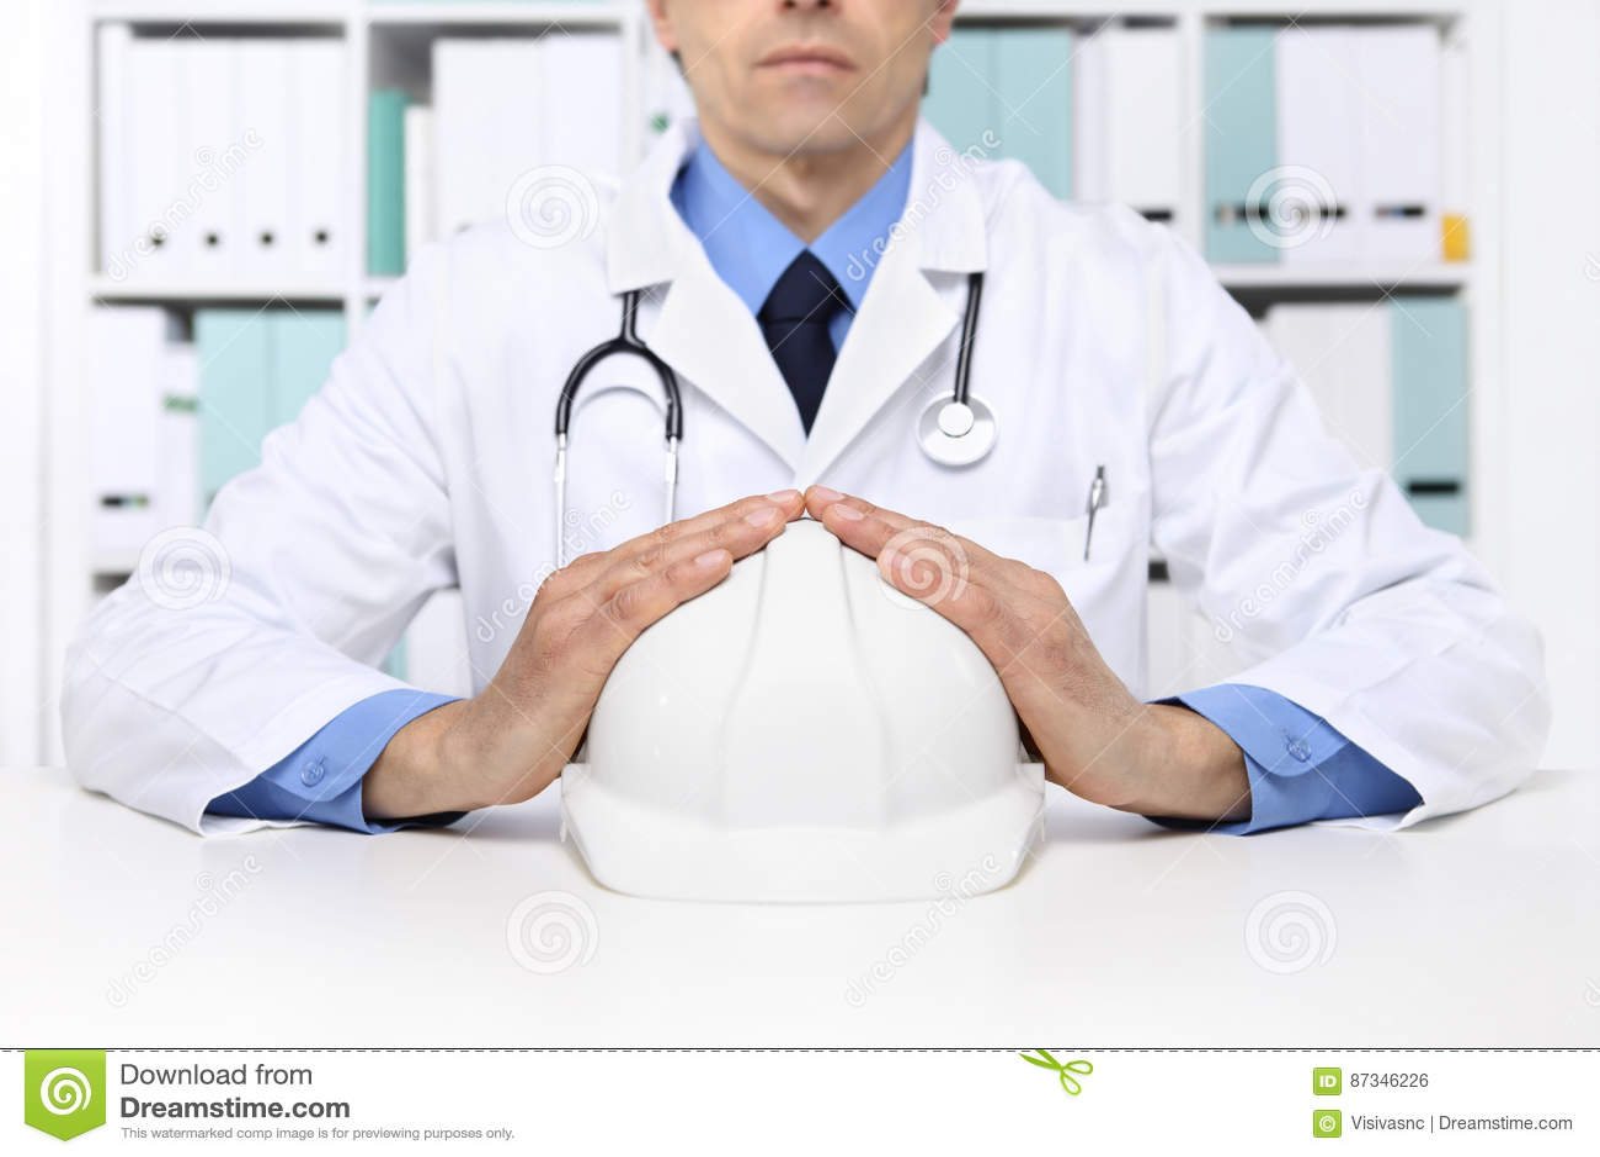 Руки врачуют защищают работника шлема, медицинского жулика медицинской страховки